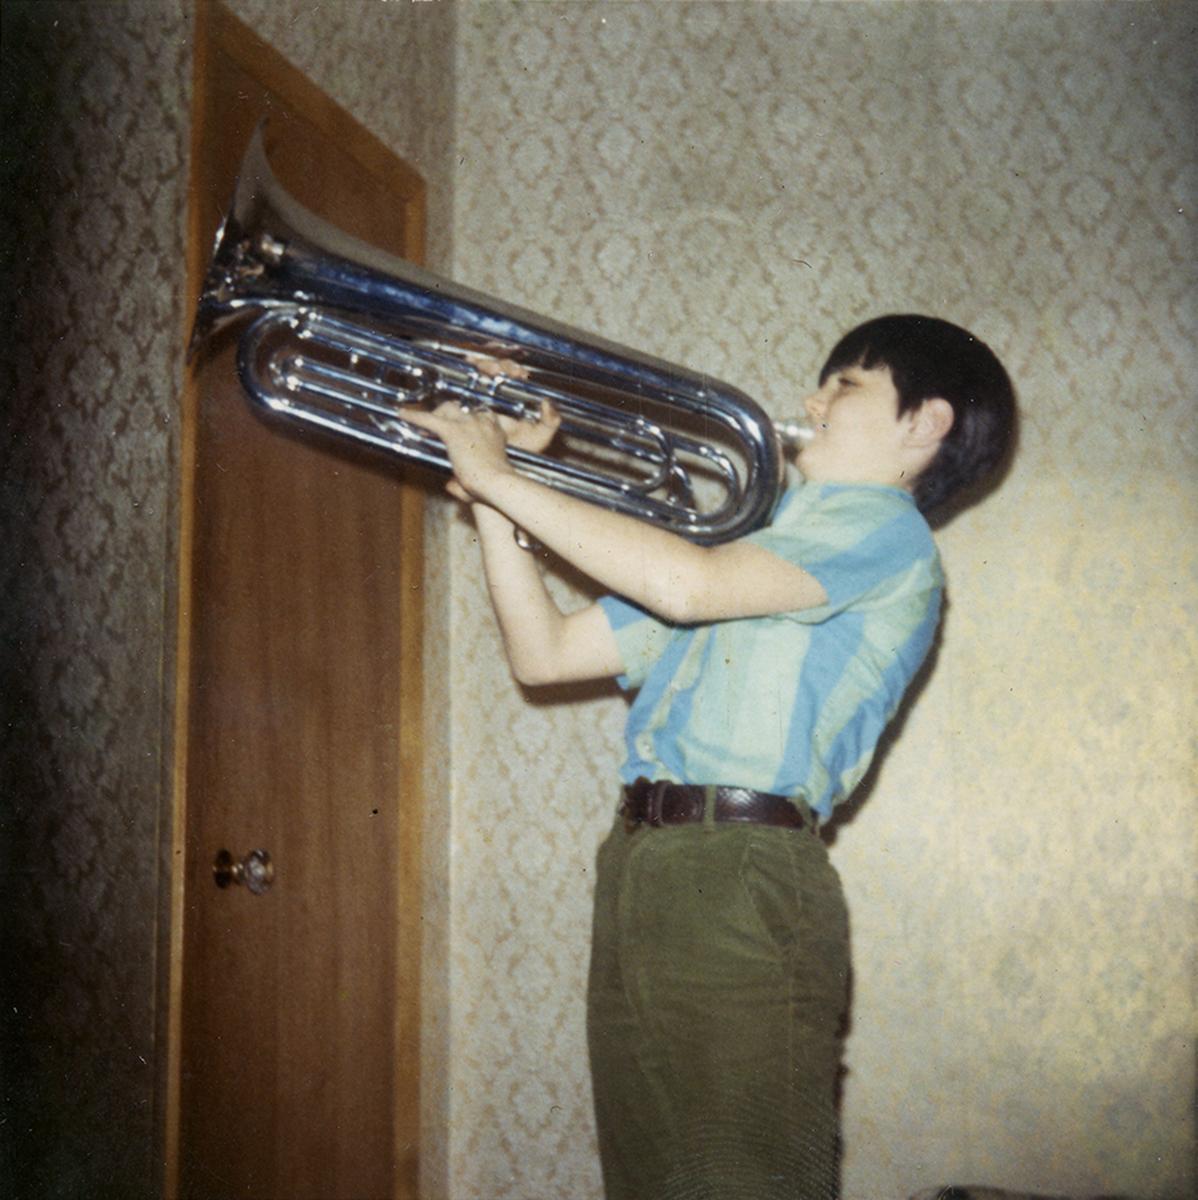 Conlon // Philadelphia & County Monaghan :: Seán playing a trumpet, Philadelphia, 1970s